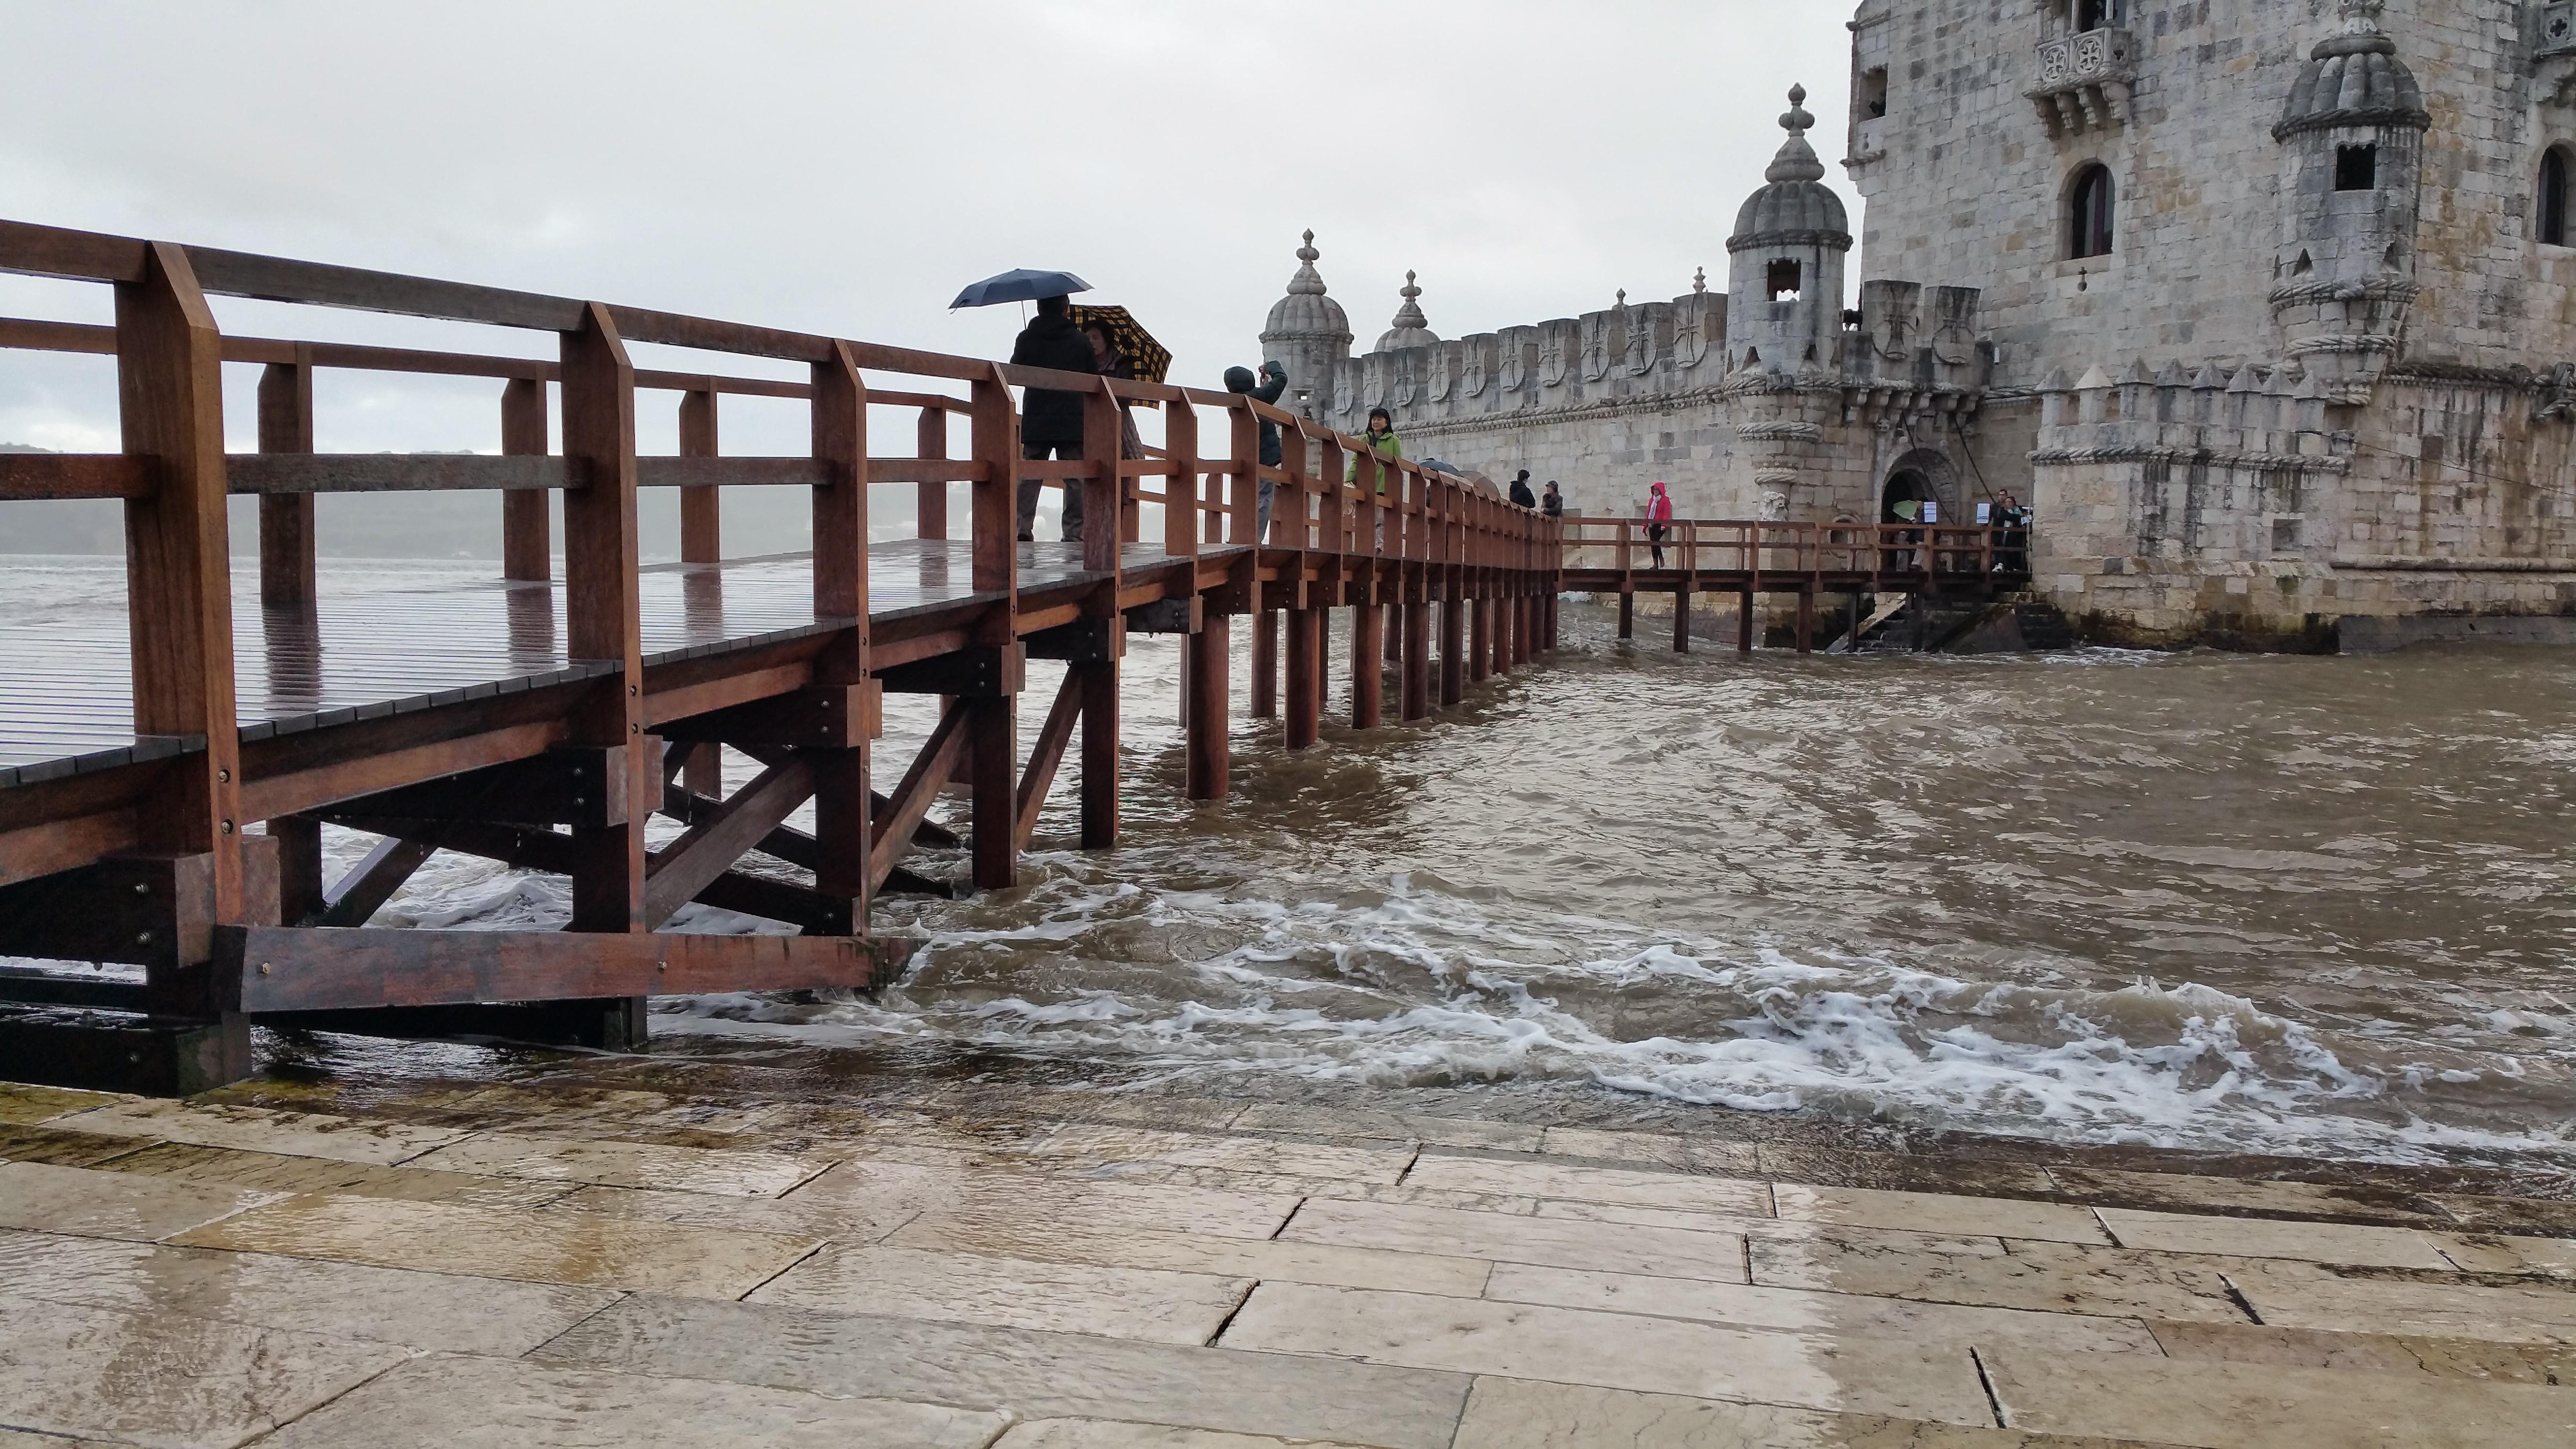 Lite bilder från Lissabon